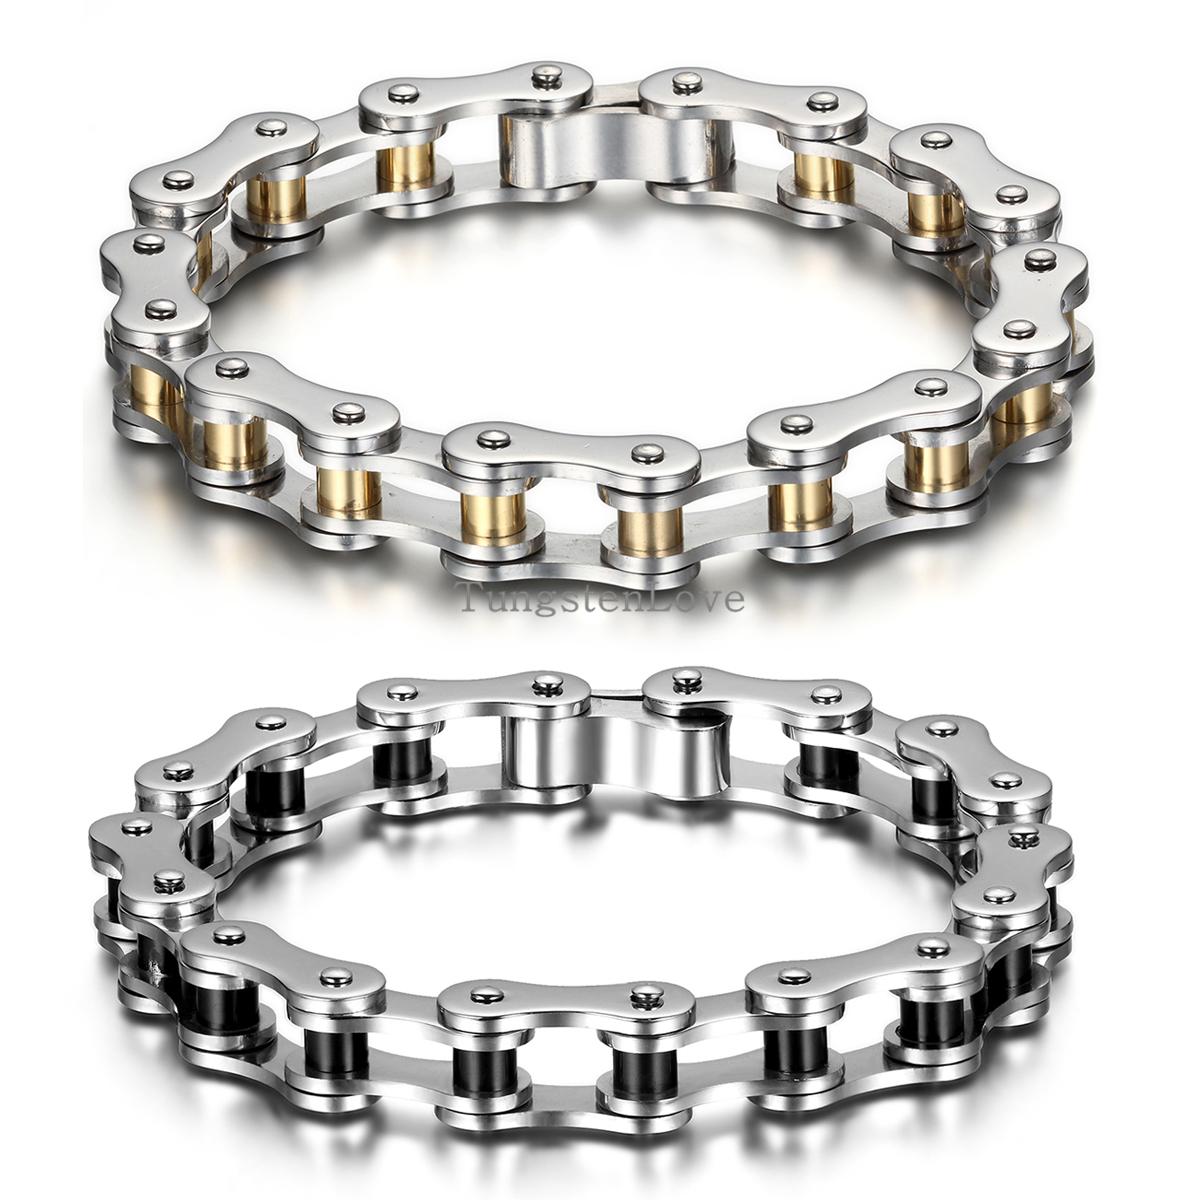 22cm*10mm Punk Stainless Steel Bracelet Men Biker Bicycle Motorcycle Chain Men's ...